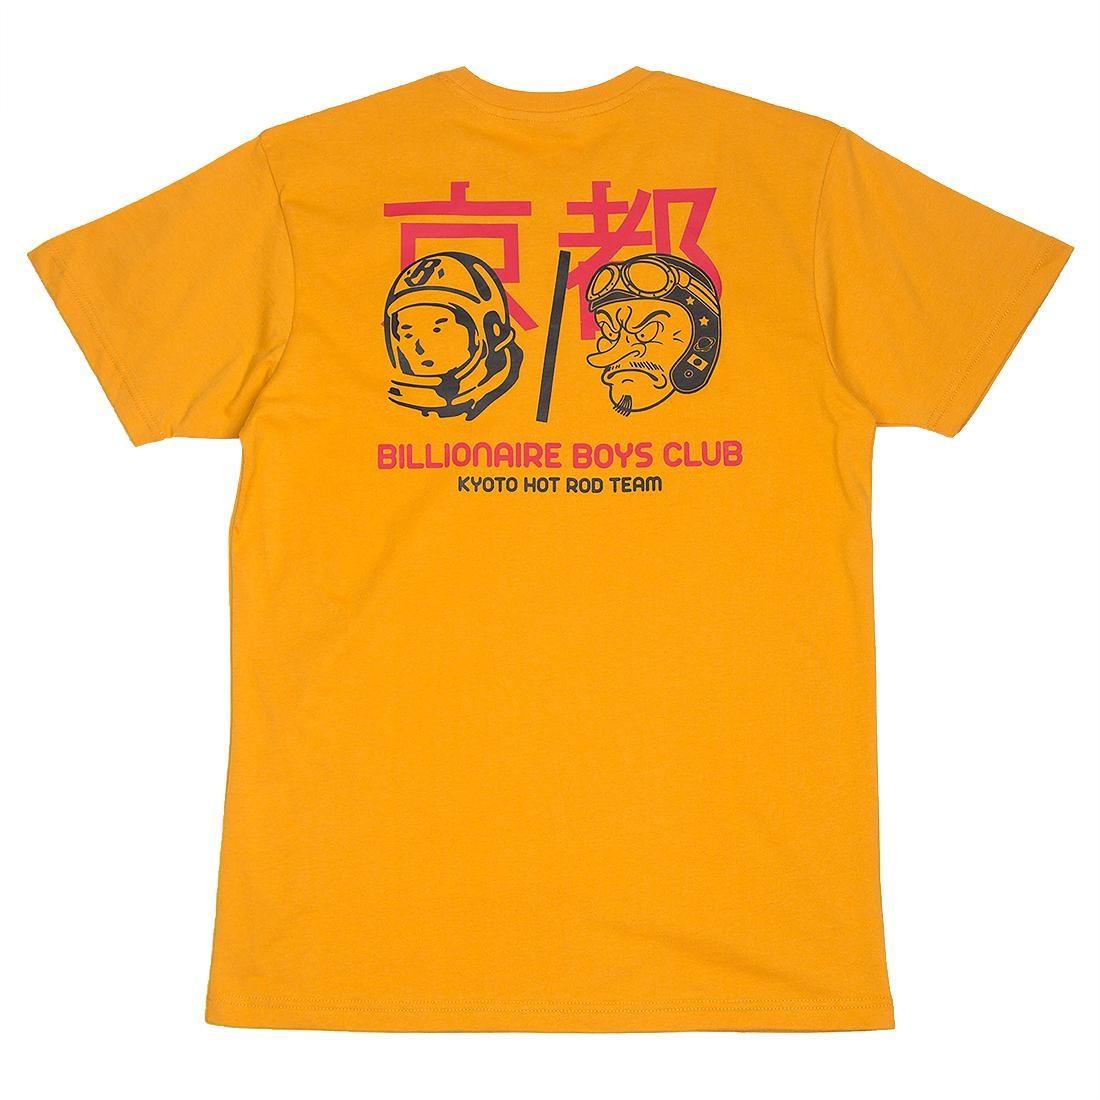 Billionaire Boys Club Men Kyoto Team Tee (yellow / sunflower)